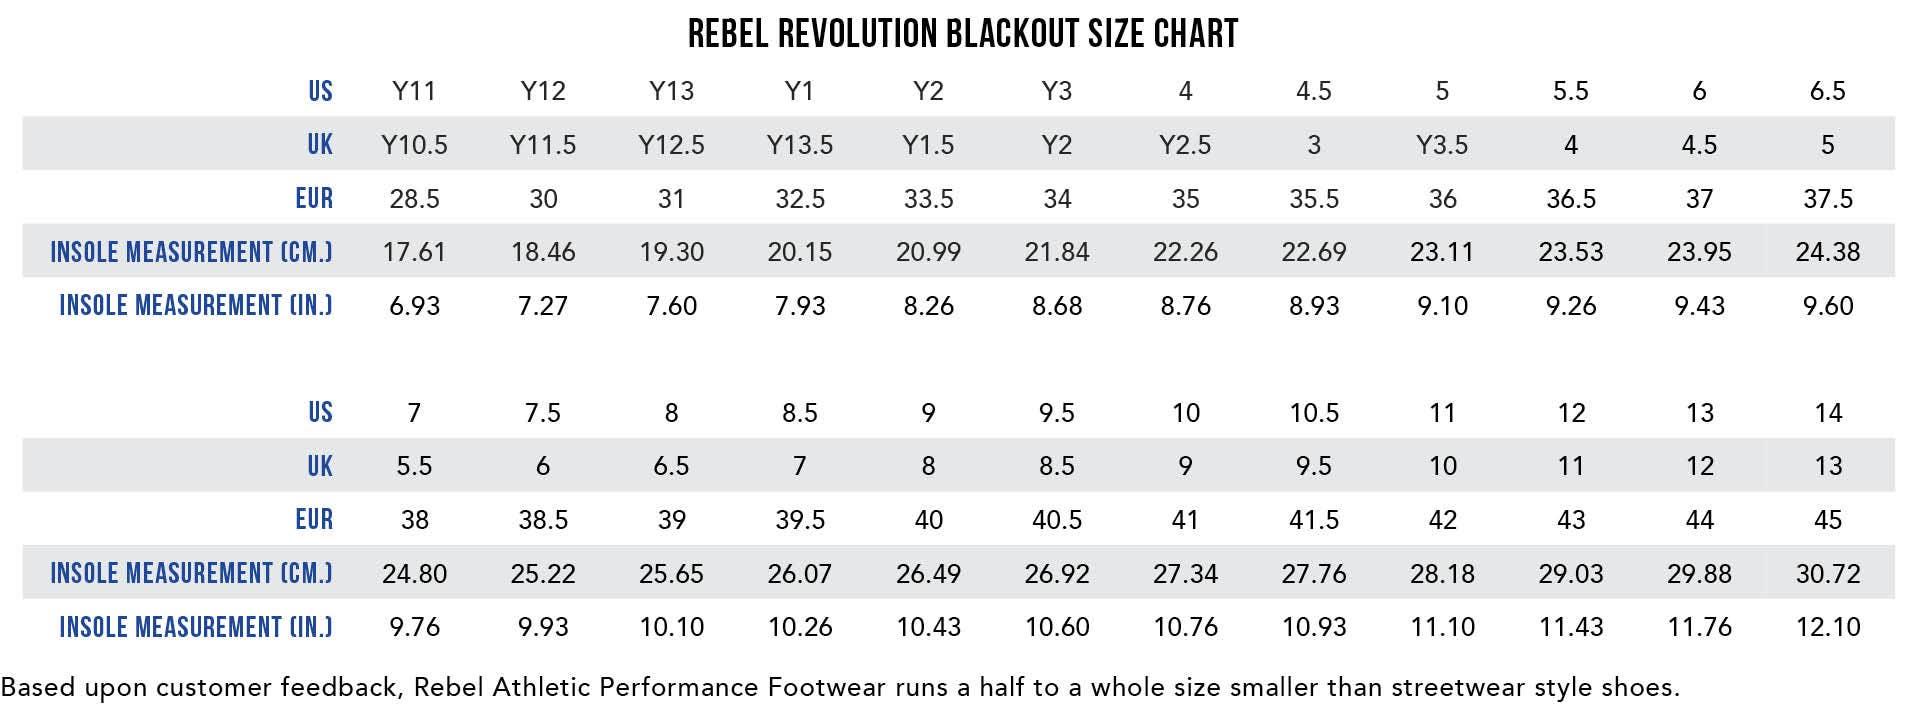 Rebel Revolution Black Cheer Shoes Size Chart